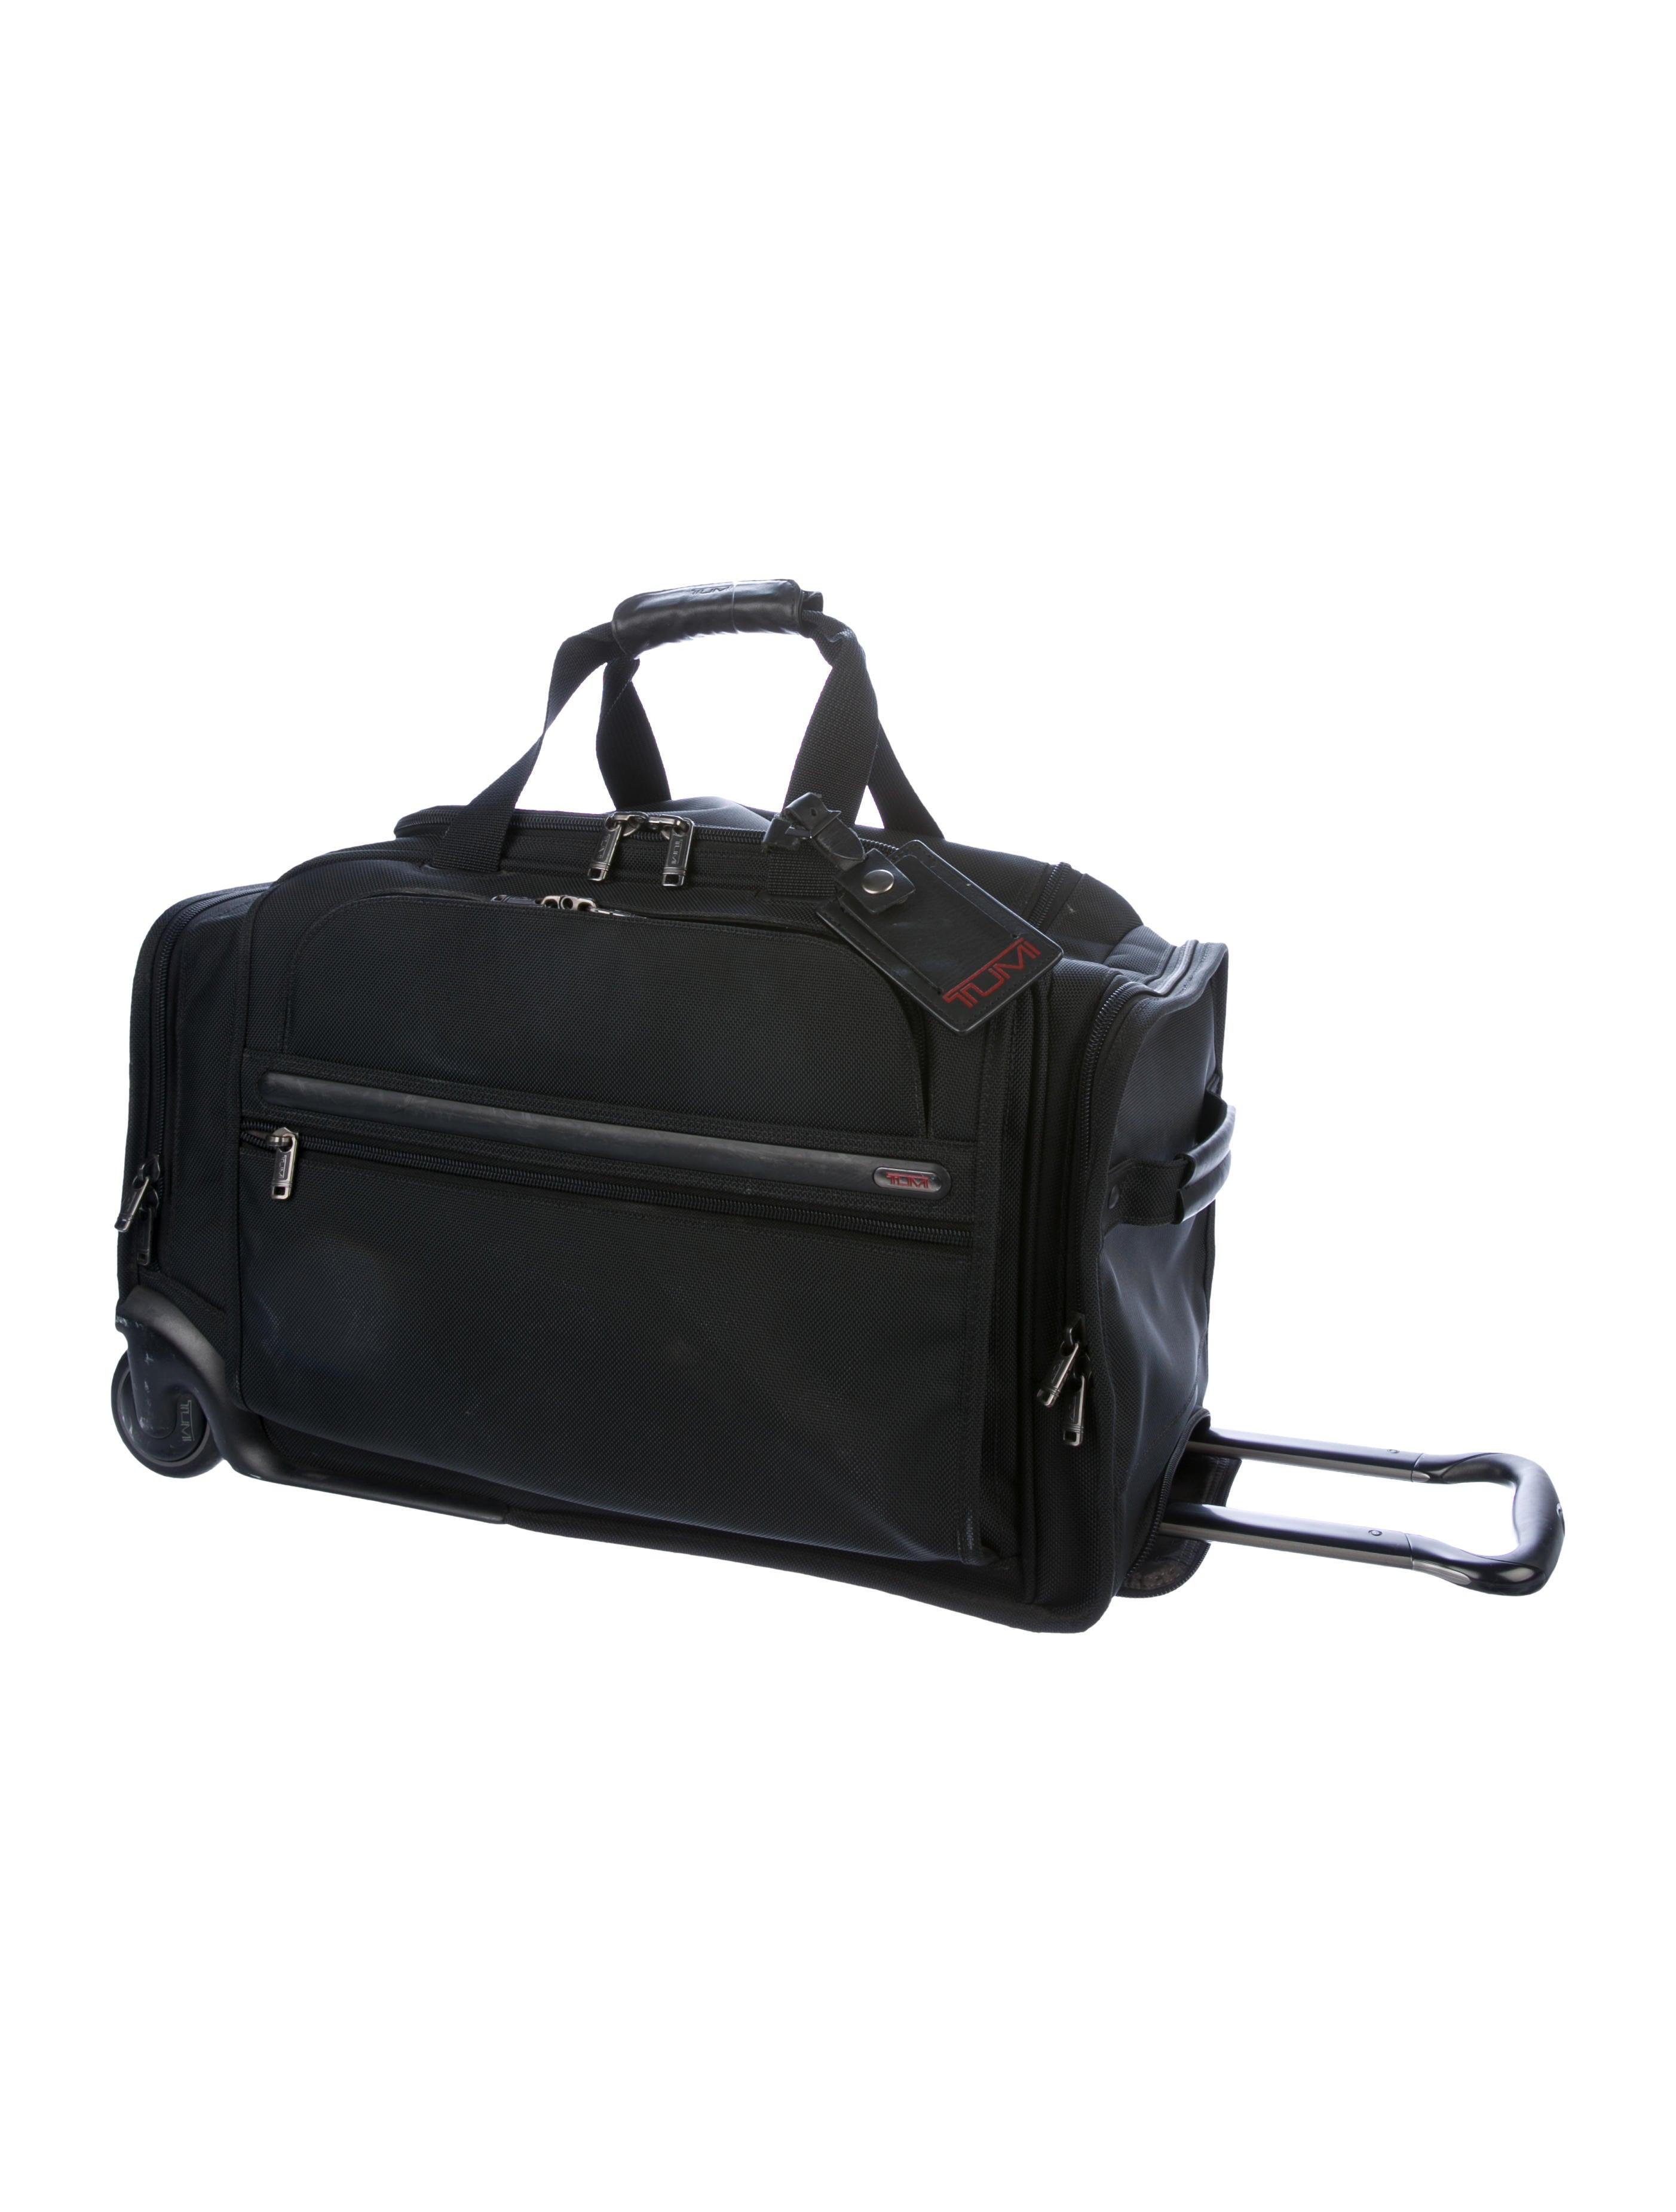 9227c43417c2 Ballistic Nylon Laptop Bags- Fenix Toulouse Handball